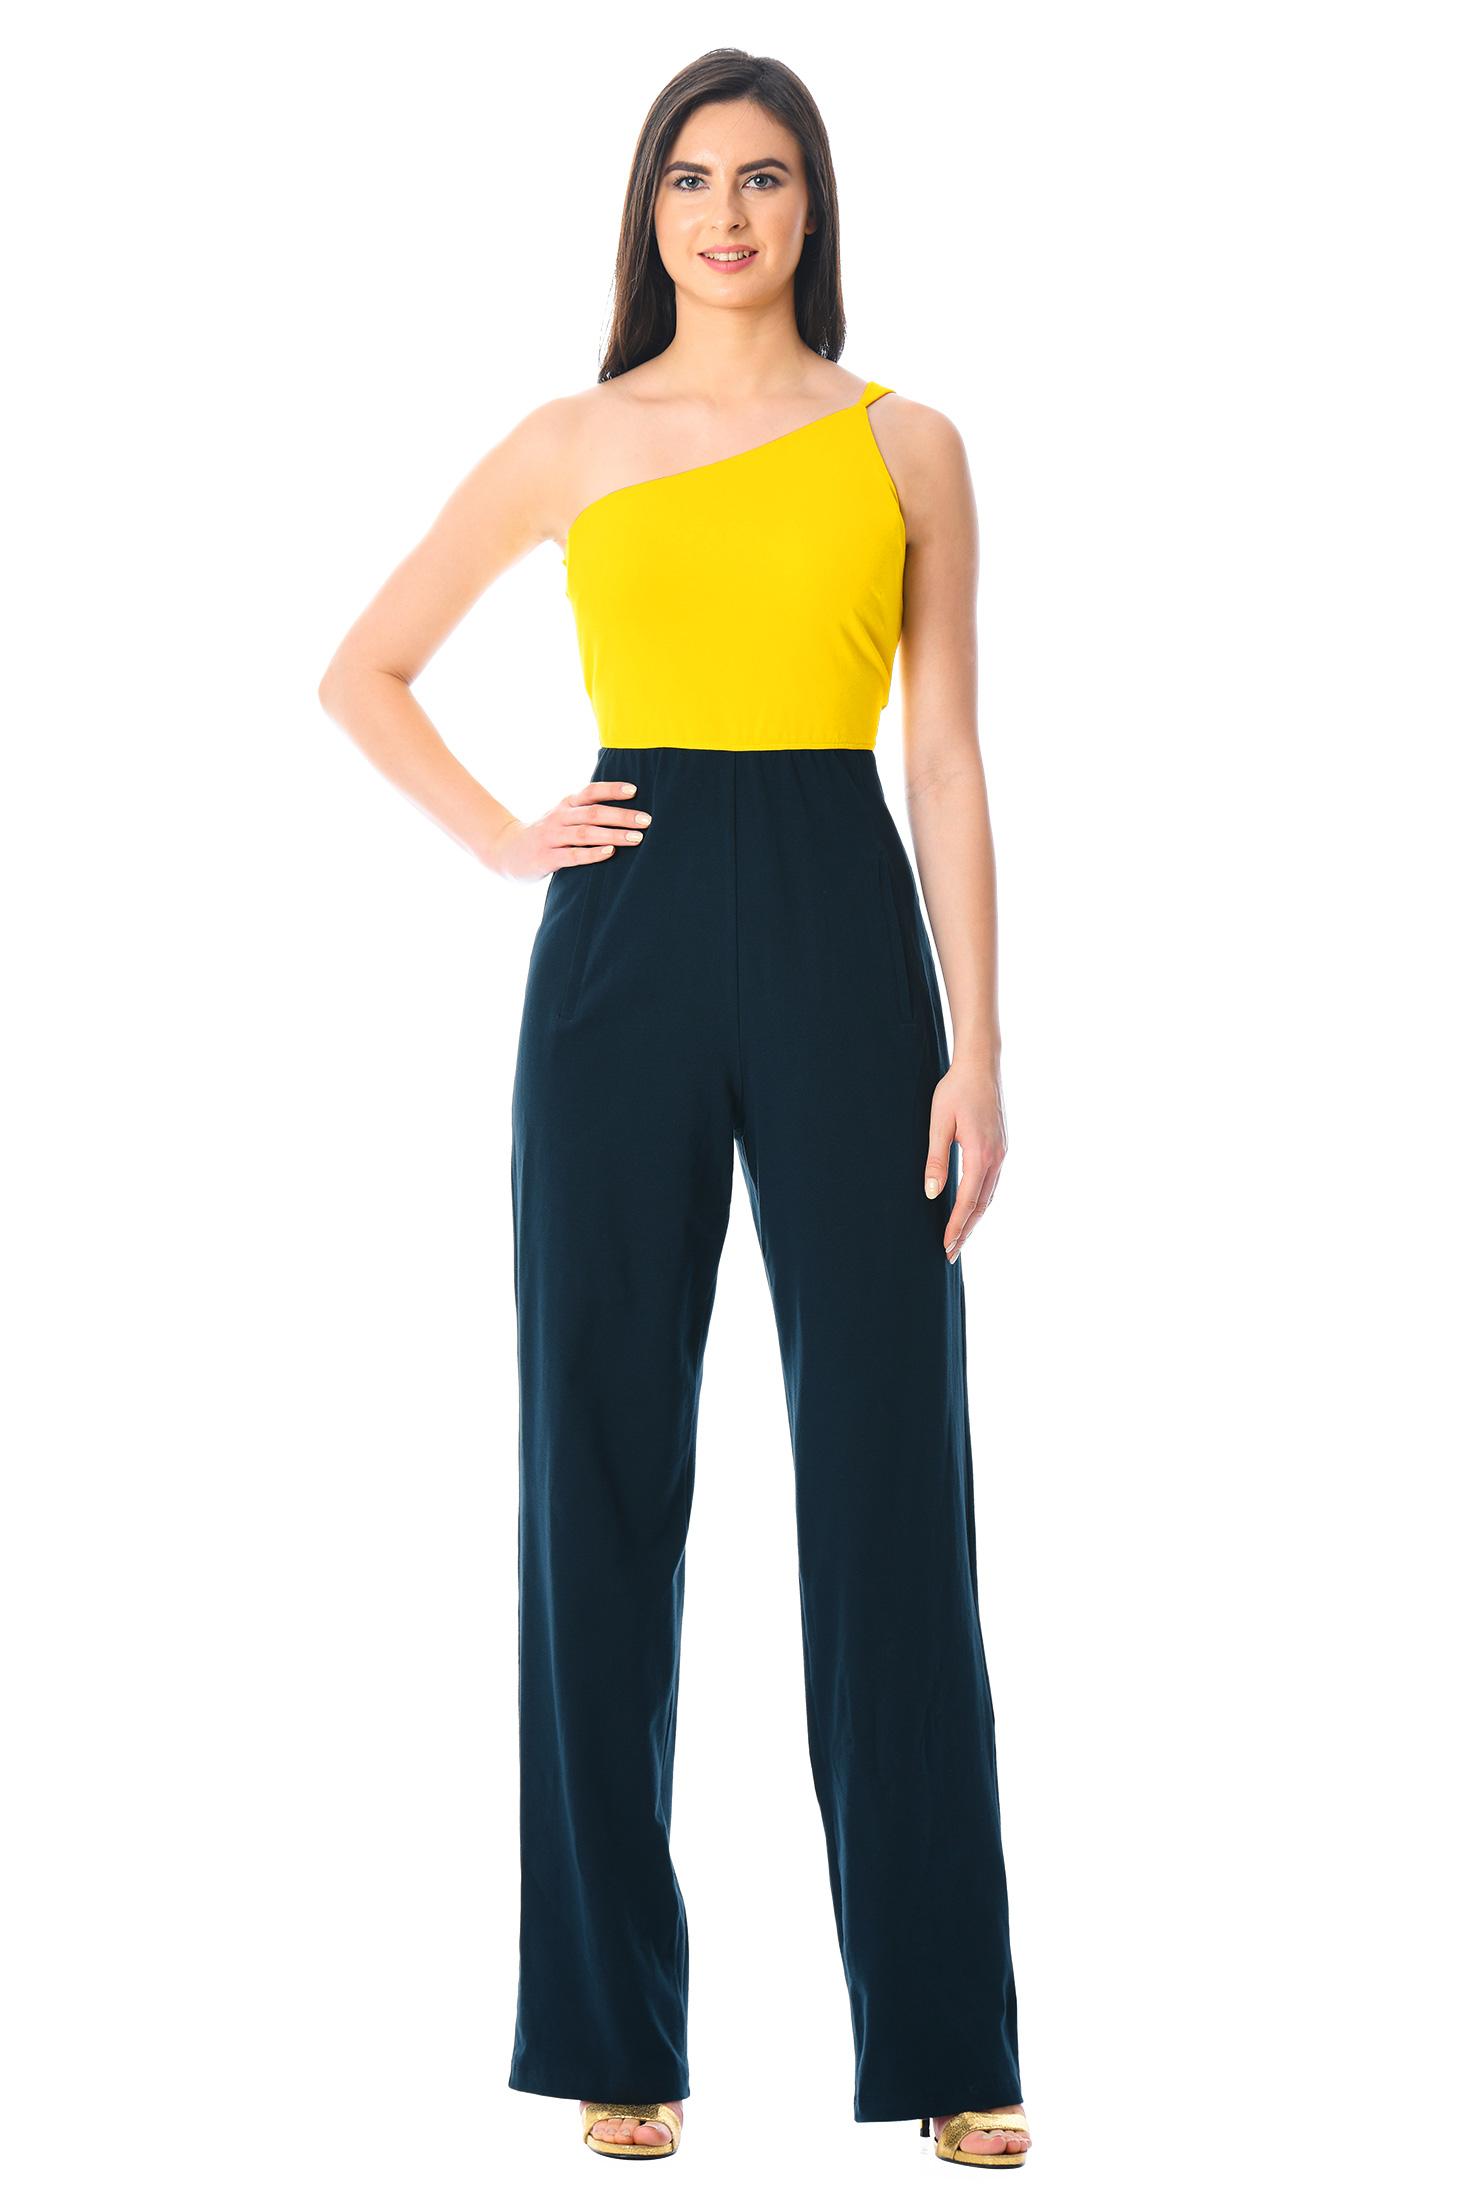 1773234794c0 Women s Fashion Clothing 0-36W and Custom